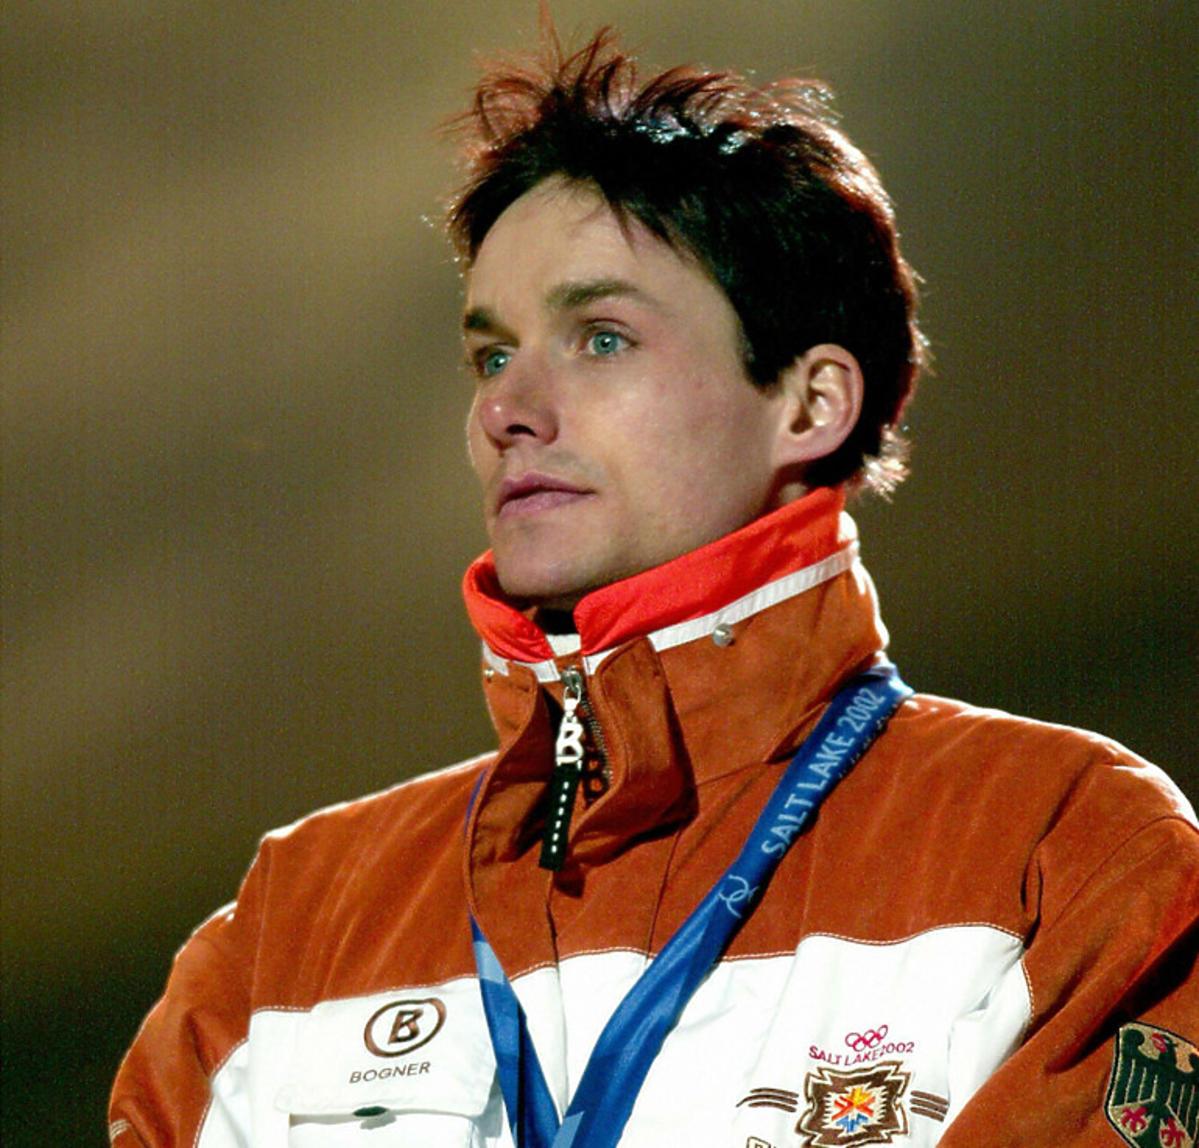 Sven Hannawald stoi z medalem na szyi, 2002 rok